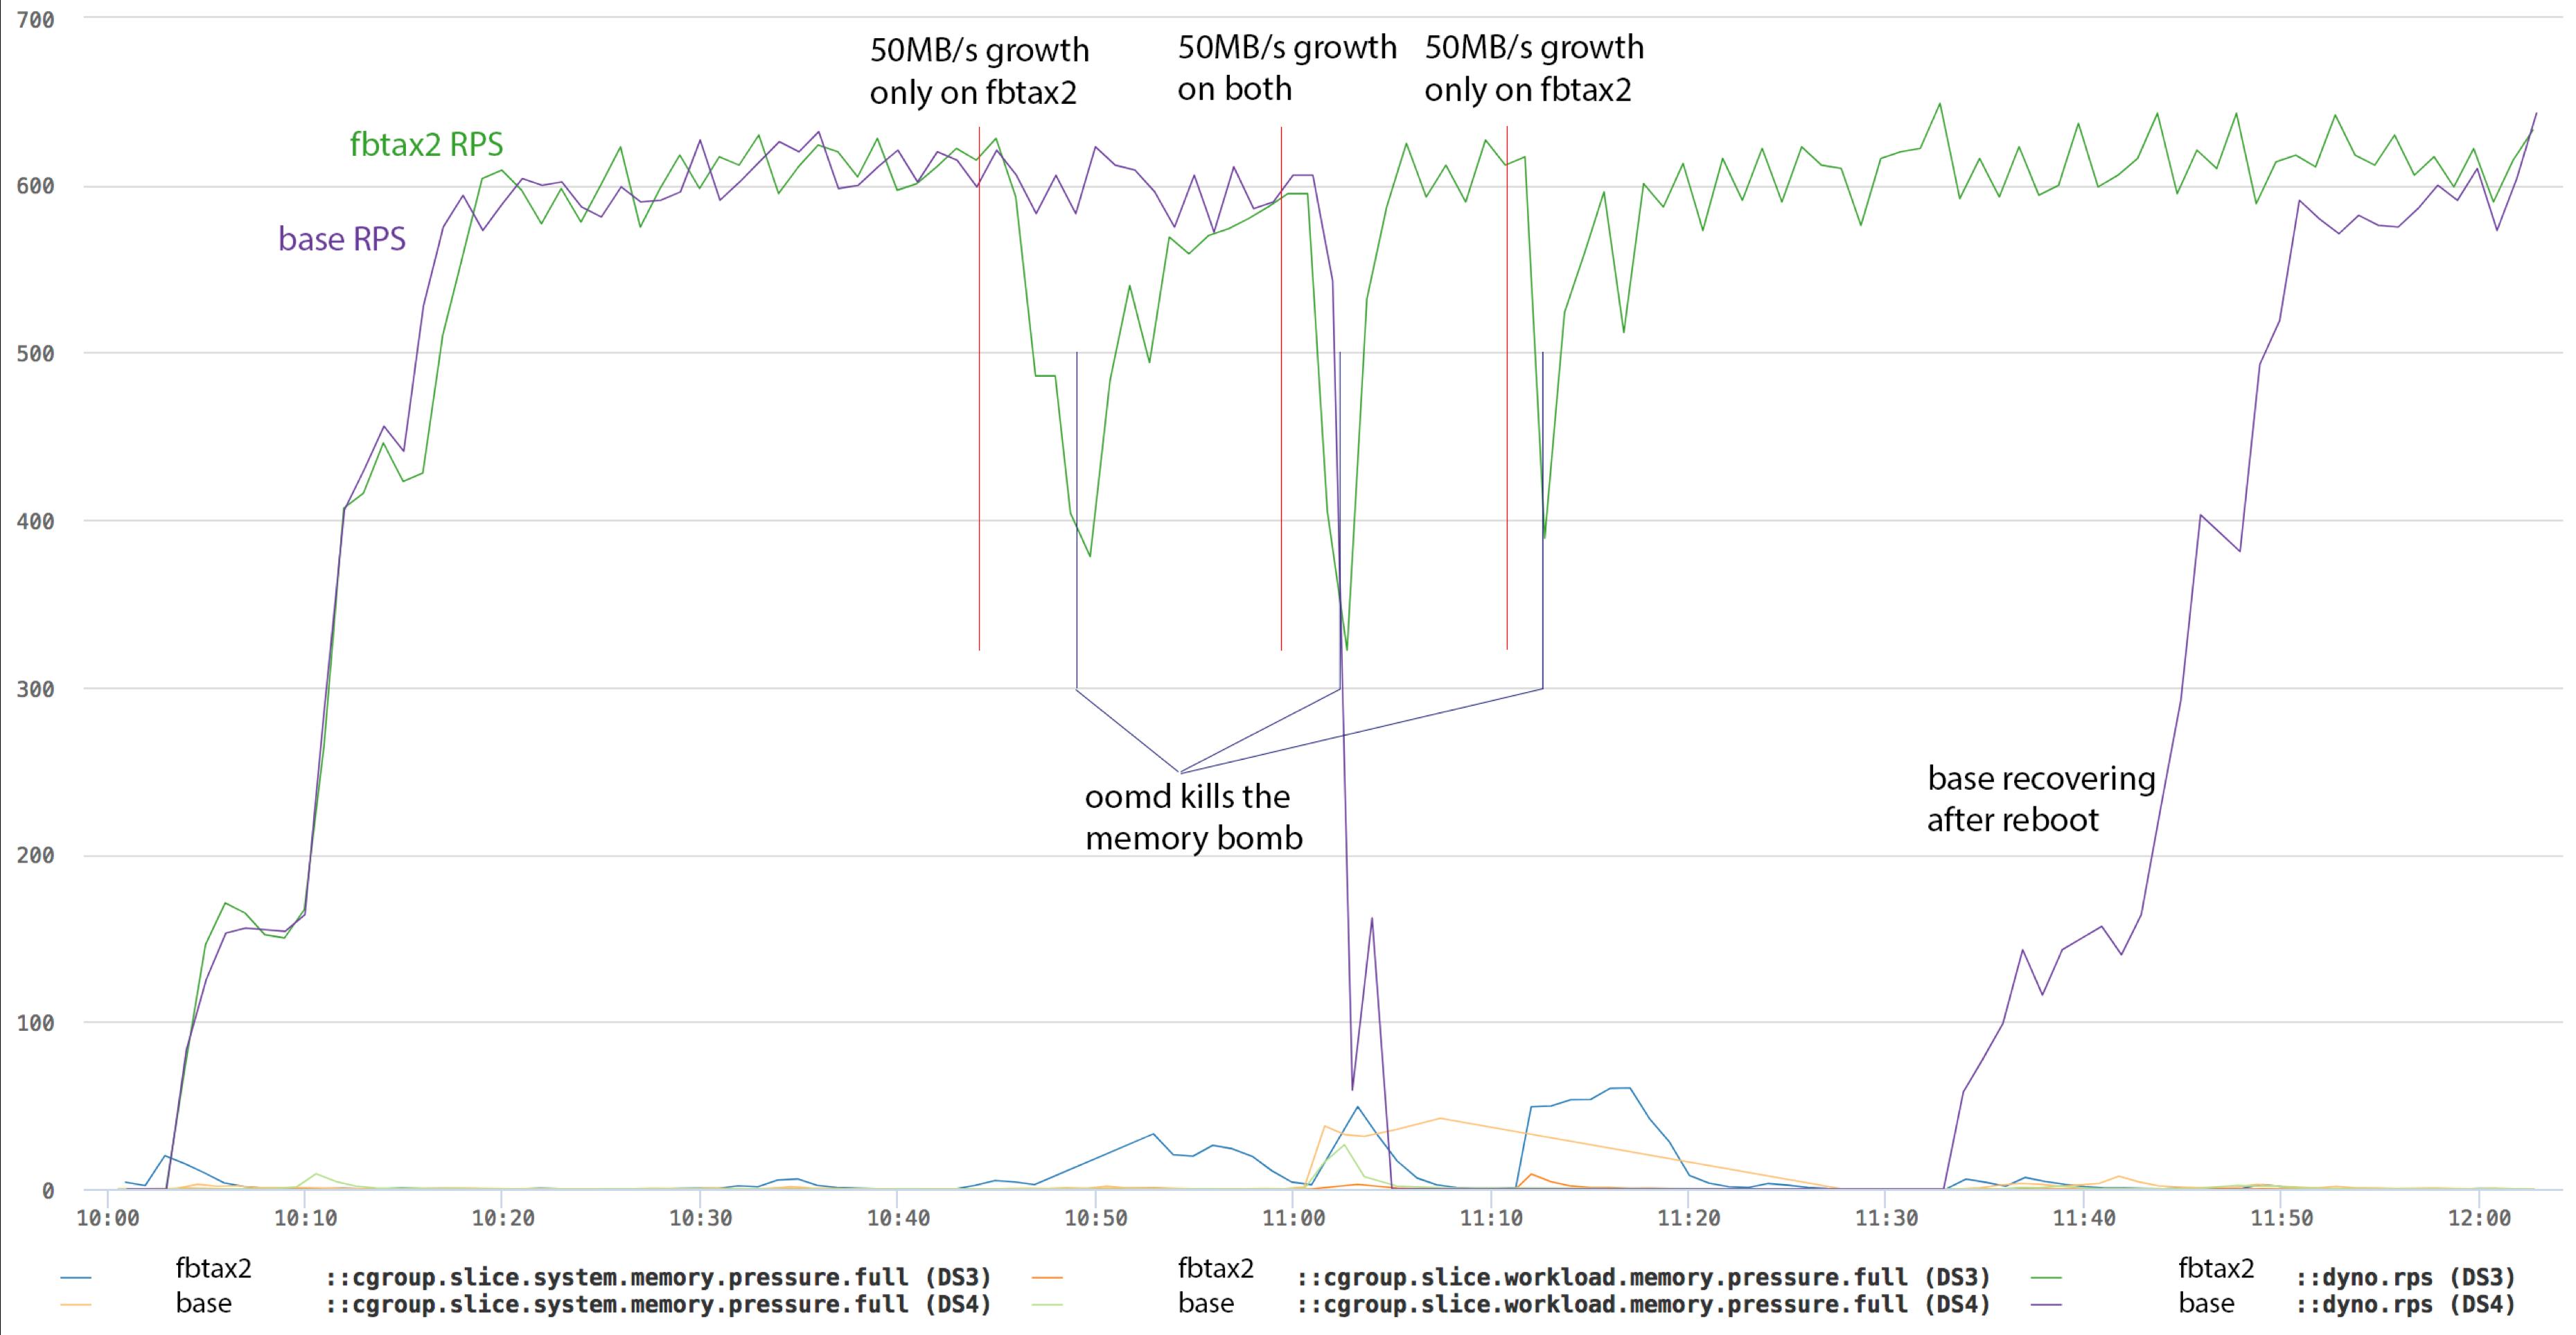 ten-mb-growth